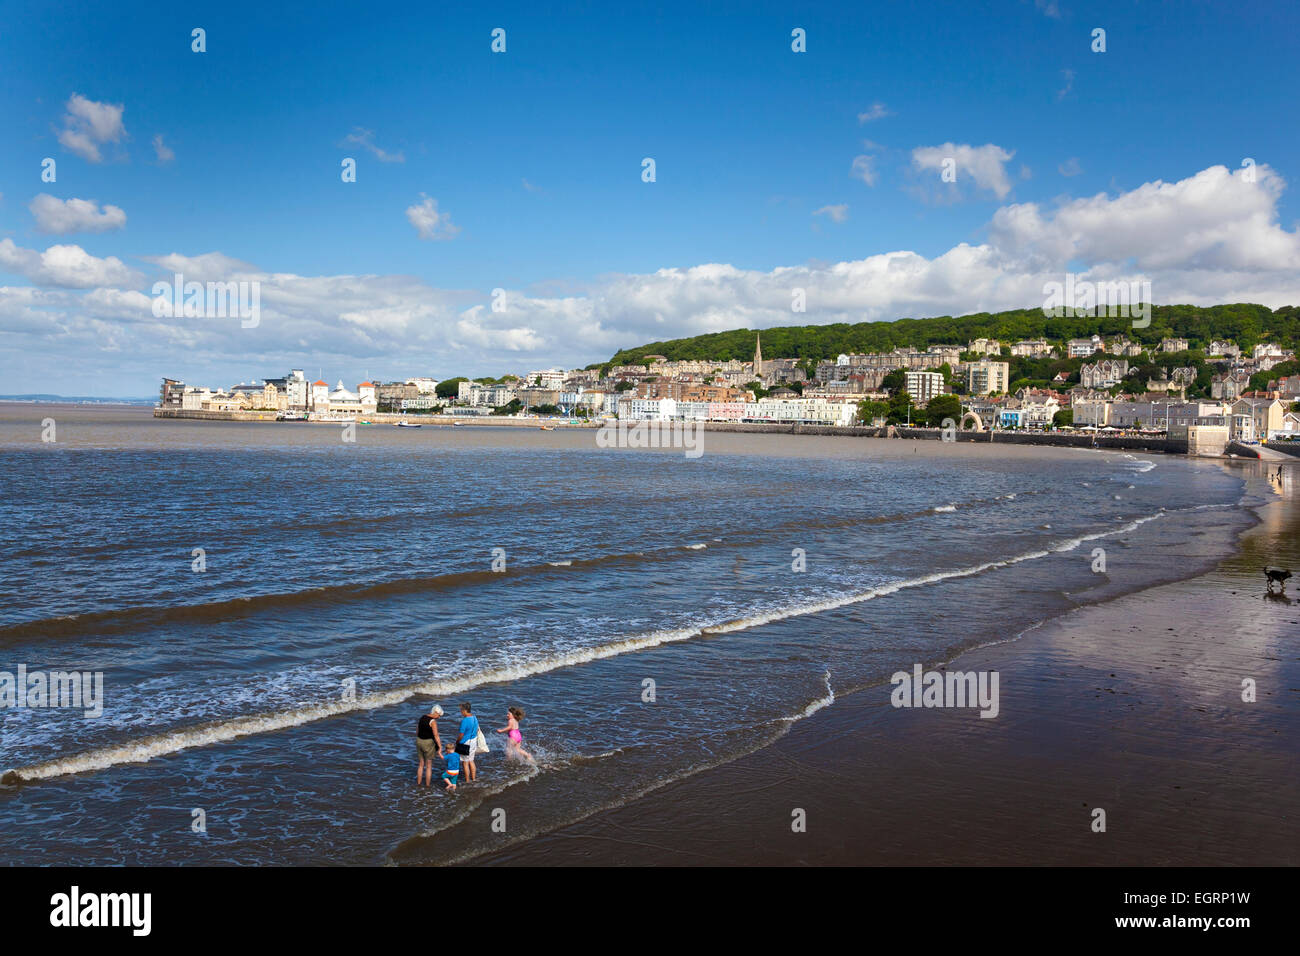 Beach in Weston-super-Mare, Somerset, England - Stock Image